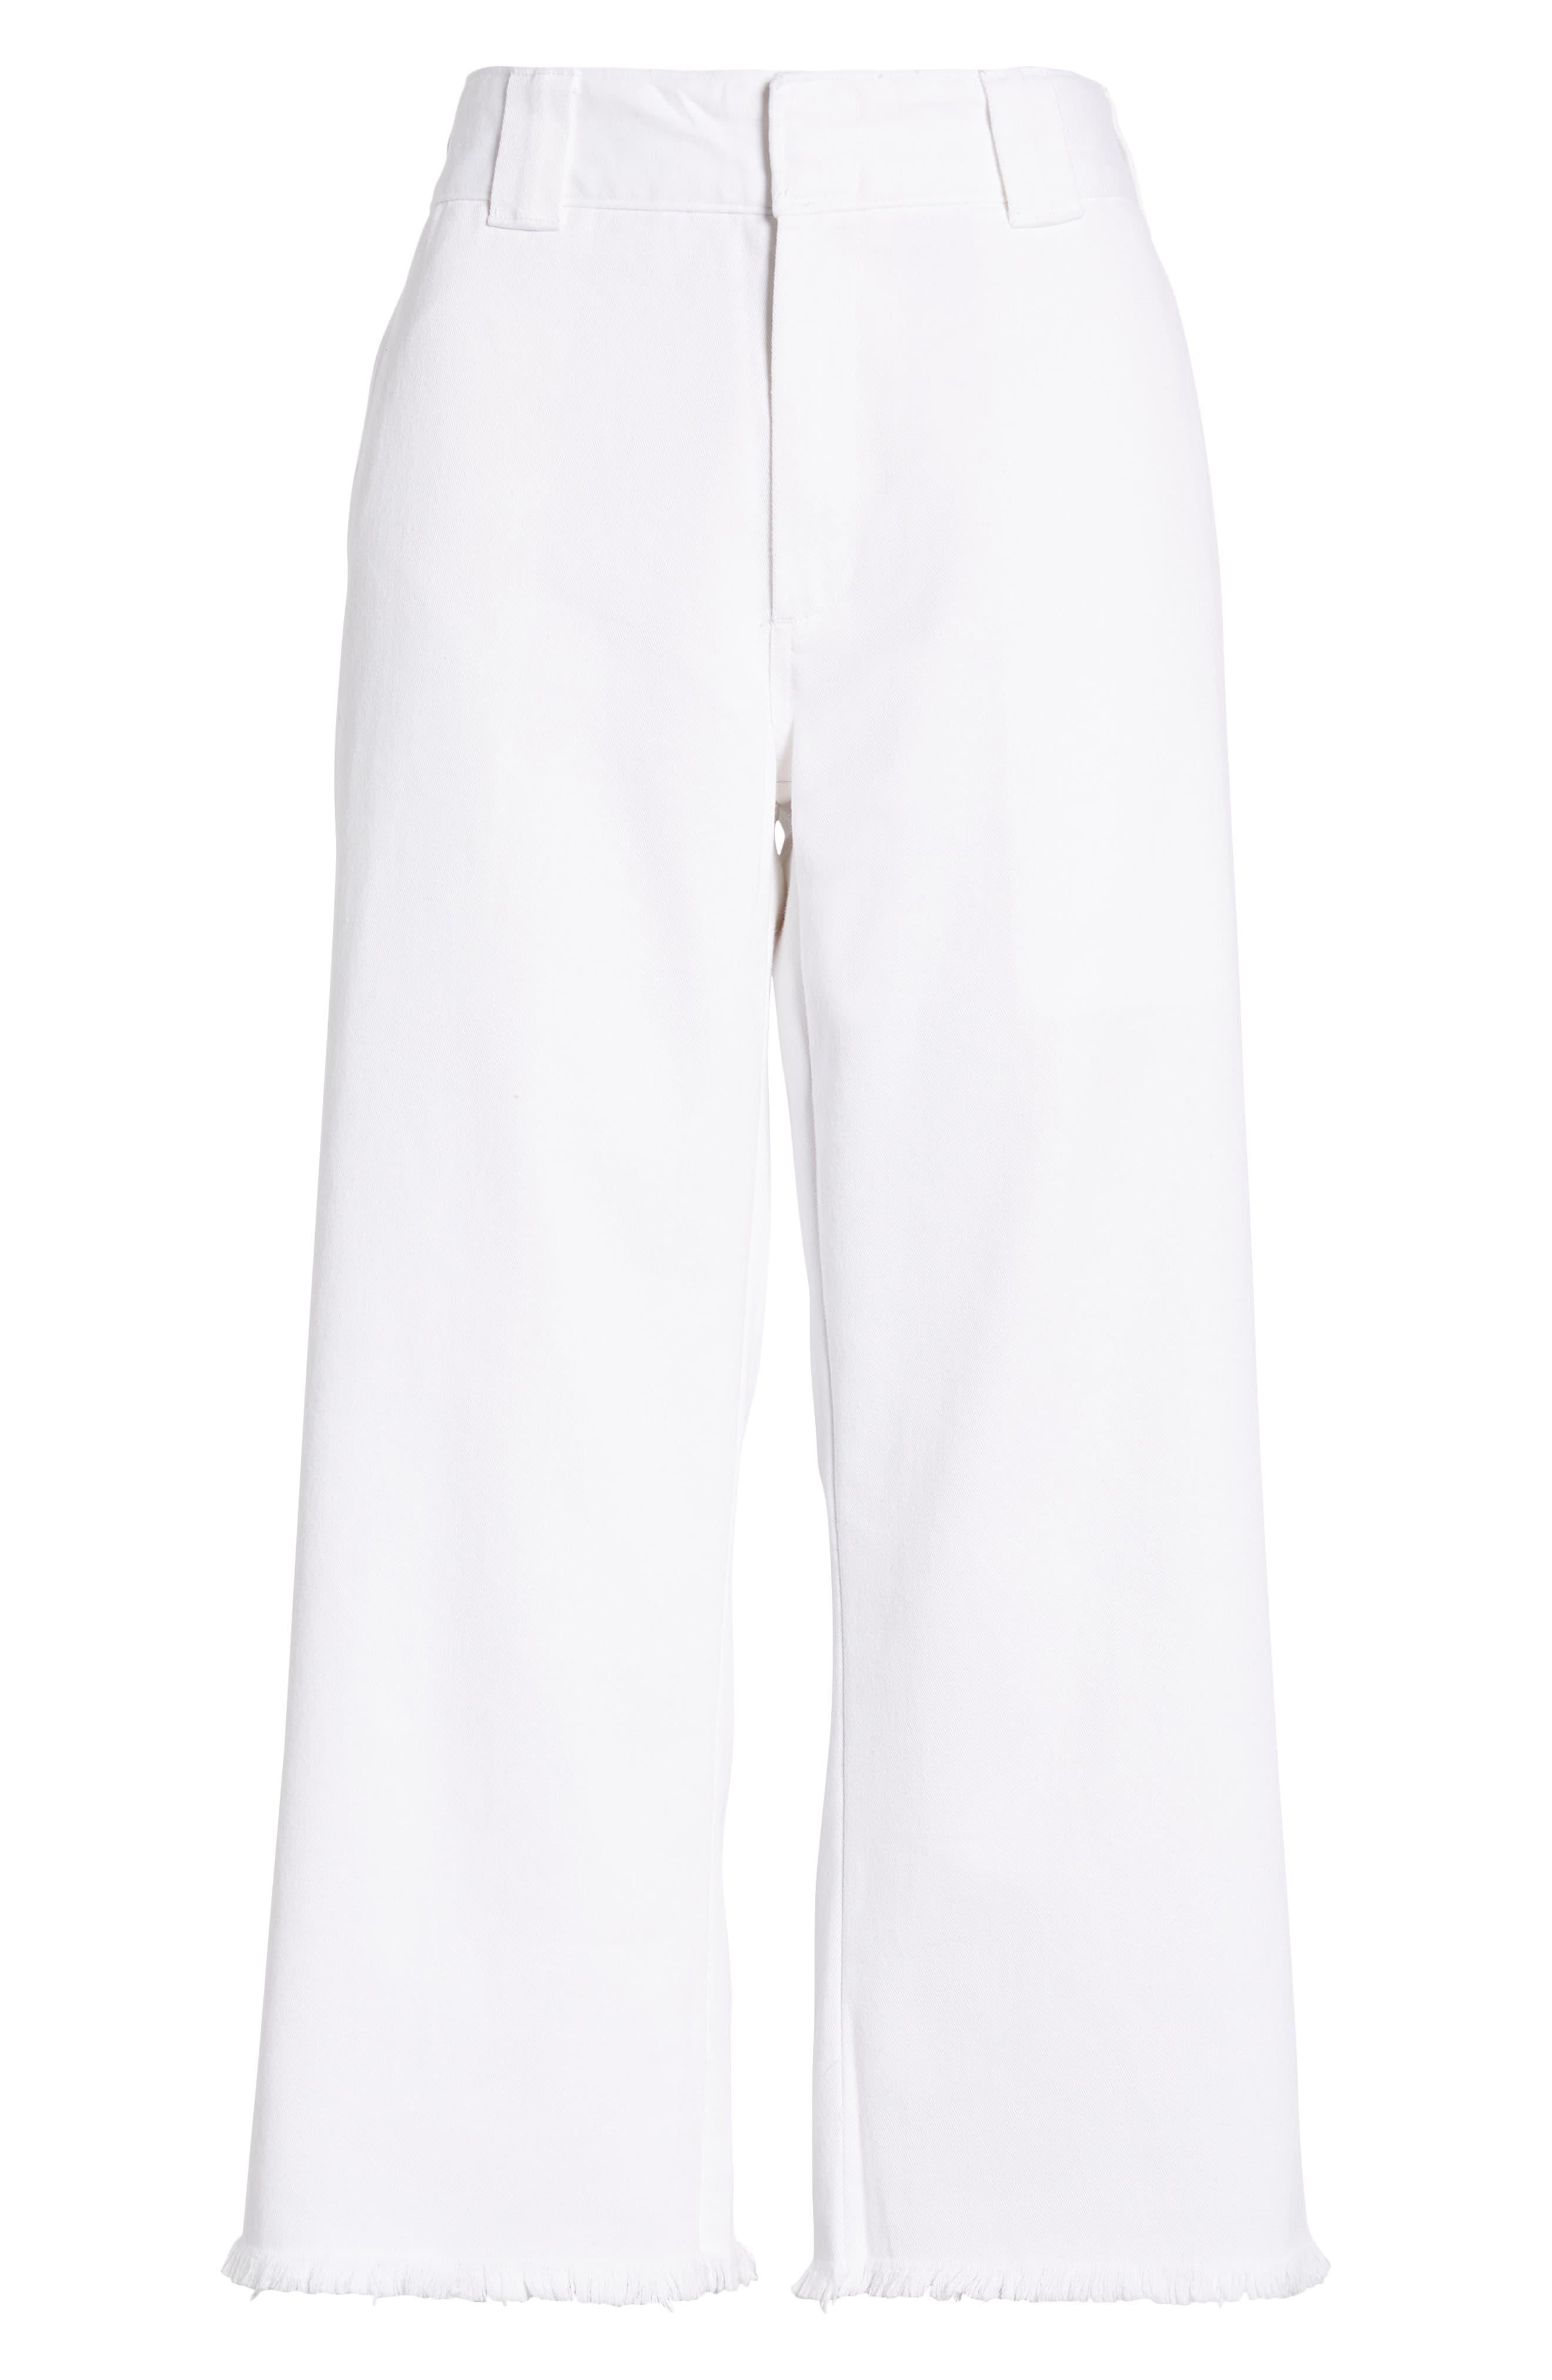 DICKIES, Fray Hem Crop Work Pants, Alternate thumbnail 7, color, WHITE